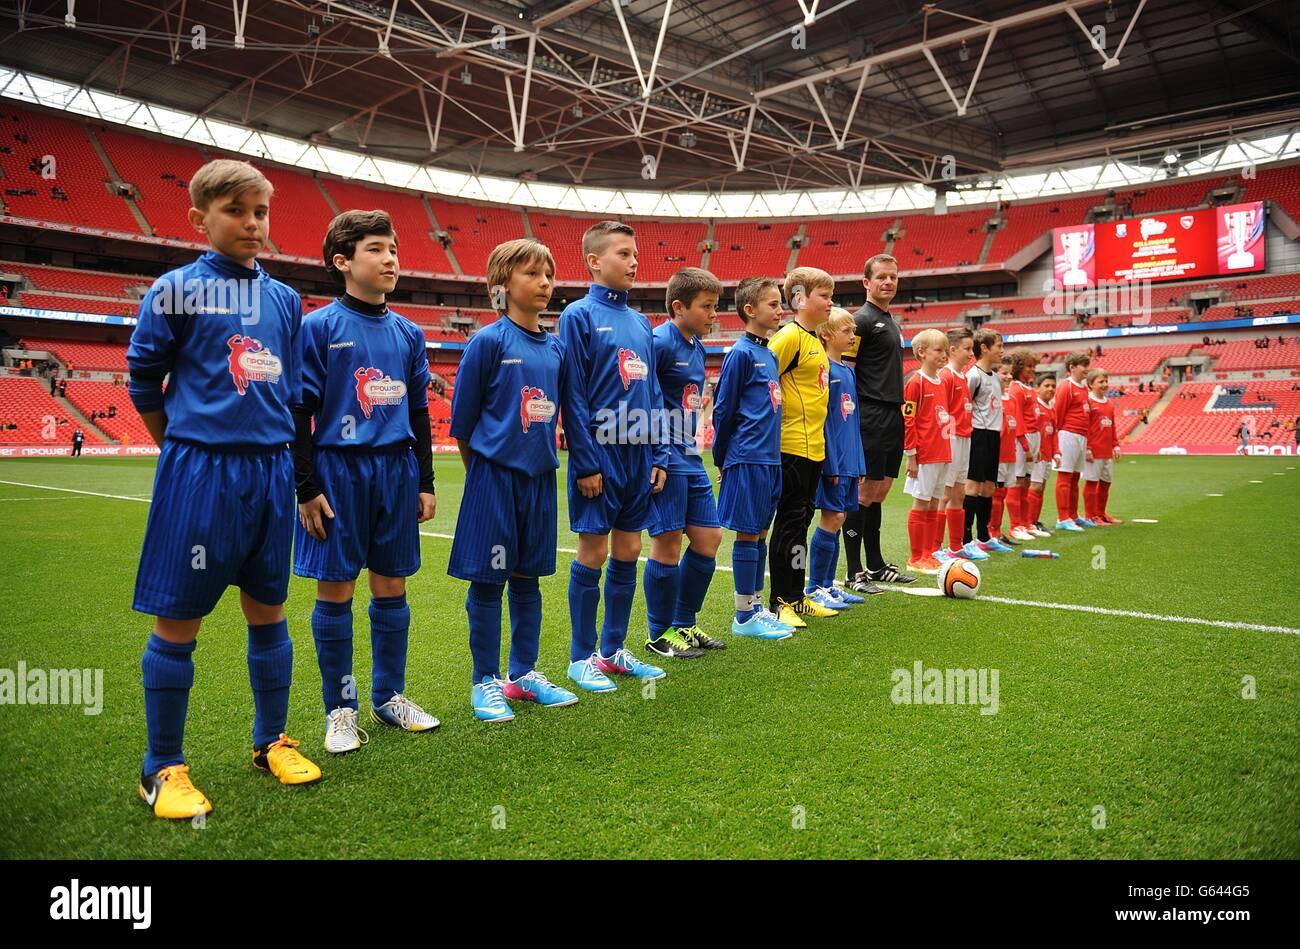 Fútbol - Liga de Fútbol npower dos - Play off - Final - Bradford City v Northampton Town - Wembley Stadium Foto de stock